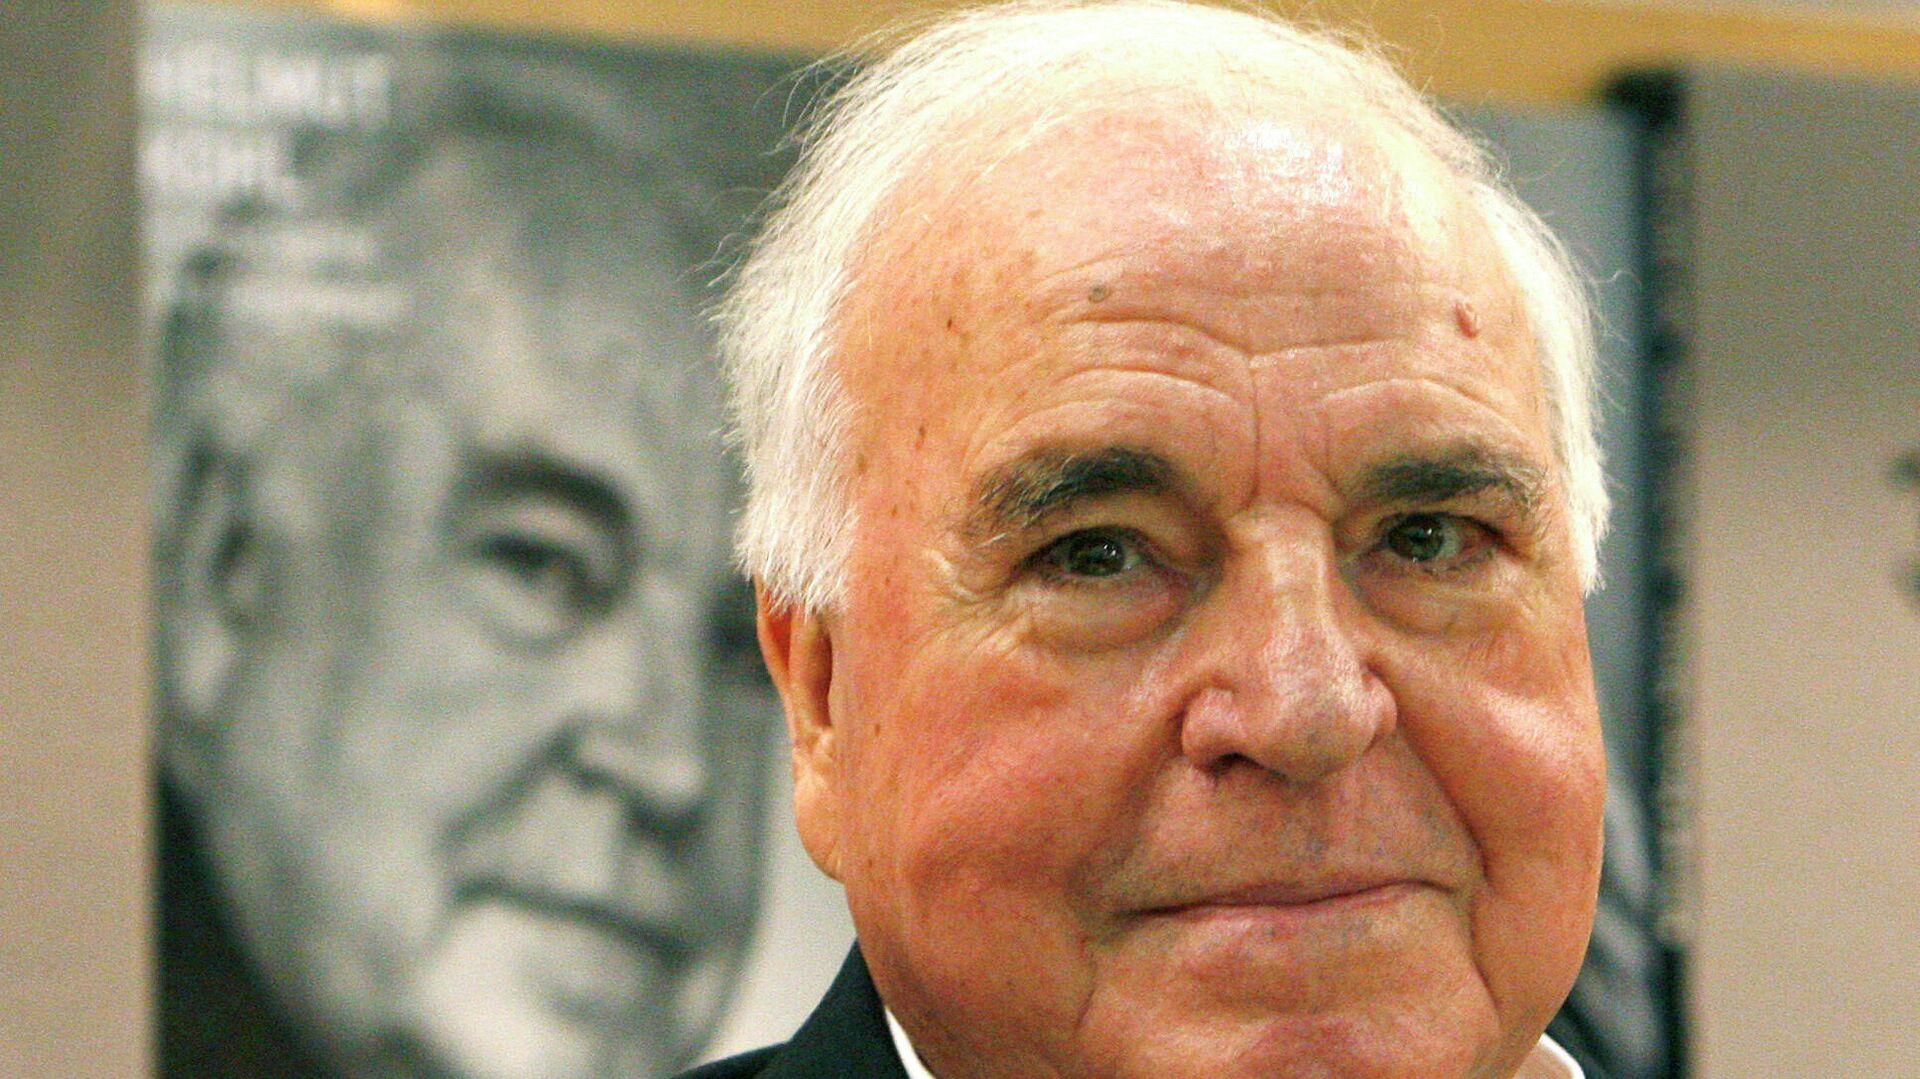 Früherer Bundeskanzler Helmut Kohl  - SNA, 1920, 21.09.2021